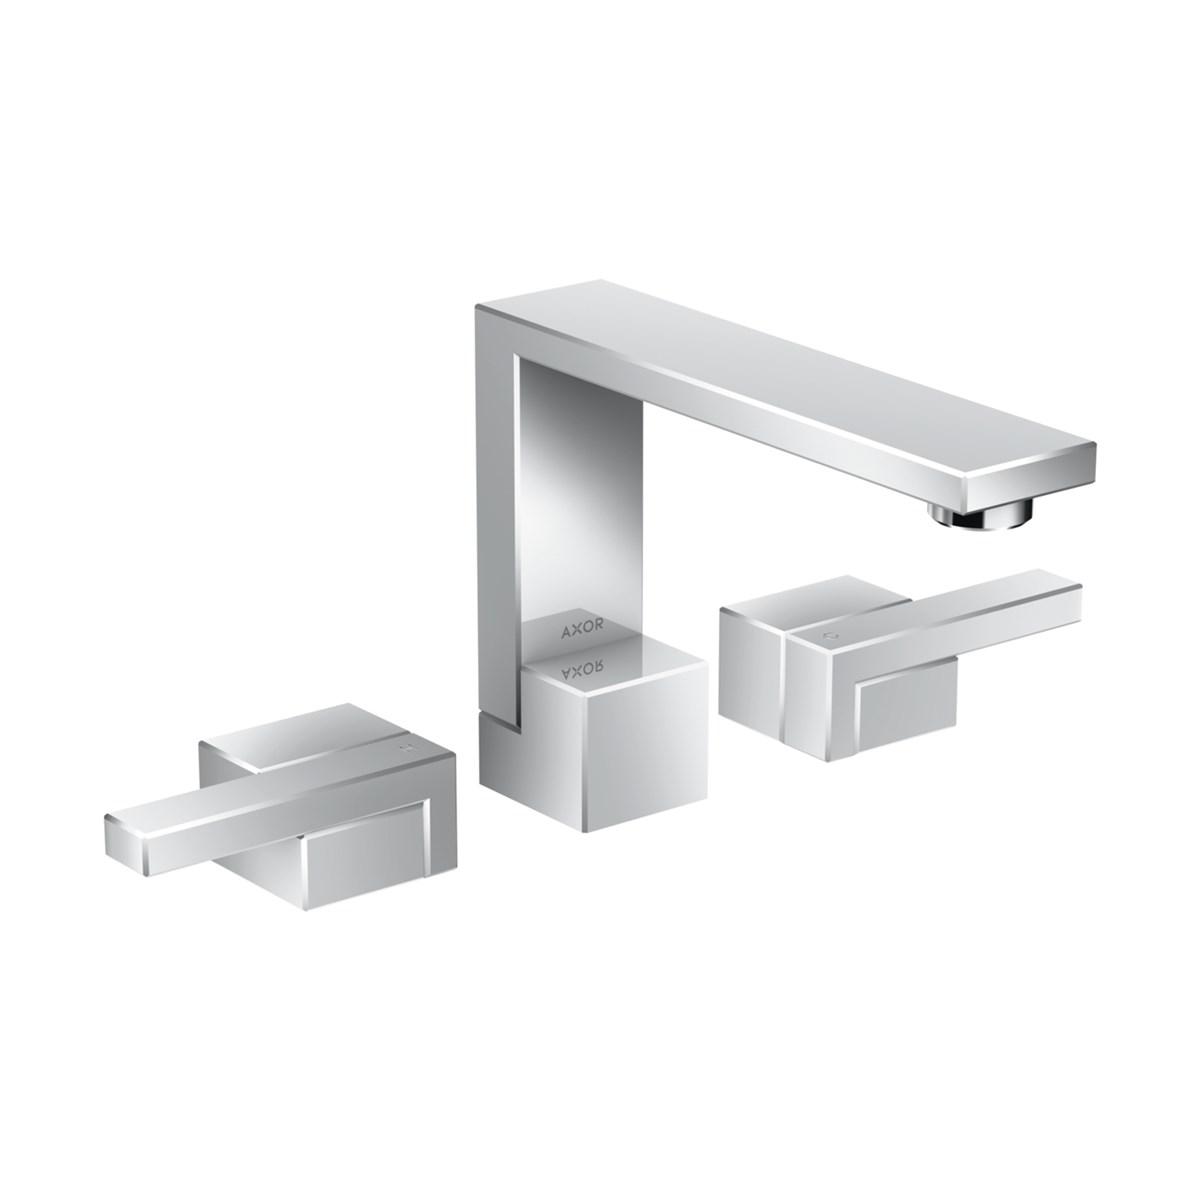 Hansgrohe-Jean-Marie-Massaud-AXOR-Edge-3-Hole-Basin-Mixer-130-46050000-Matisse-1